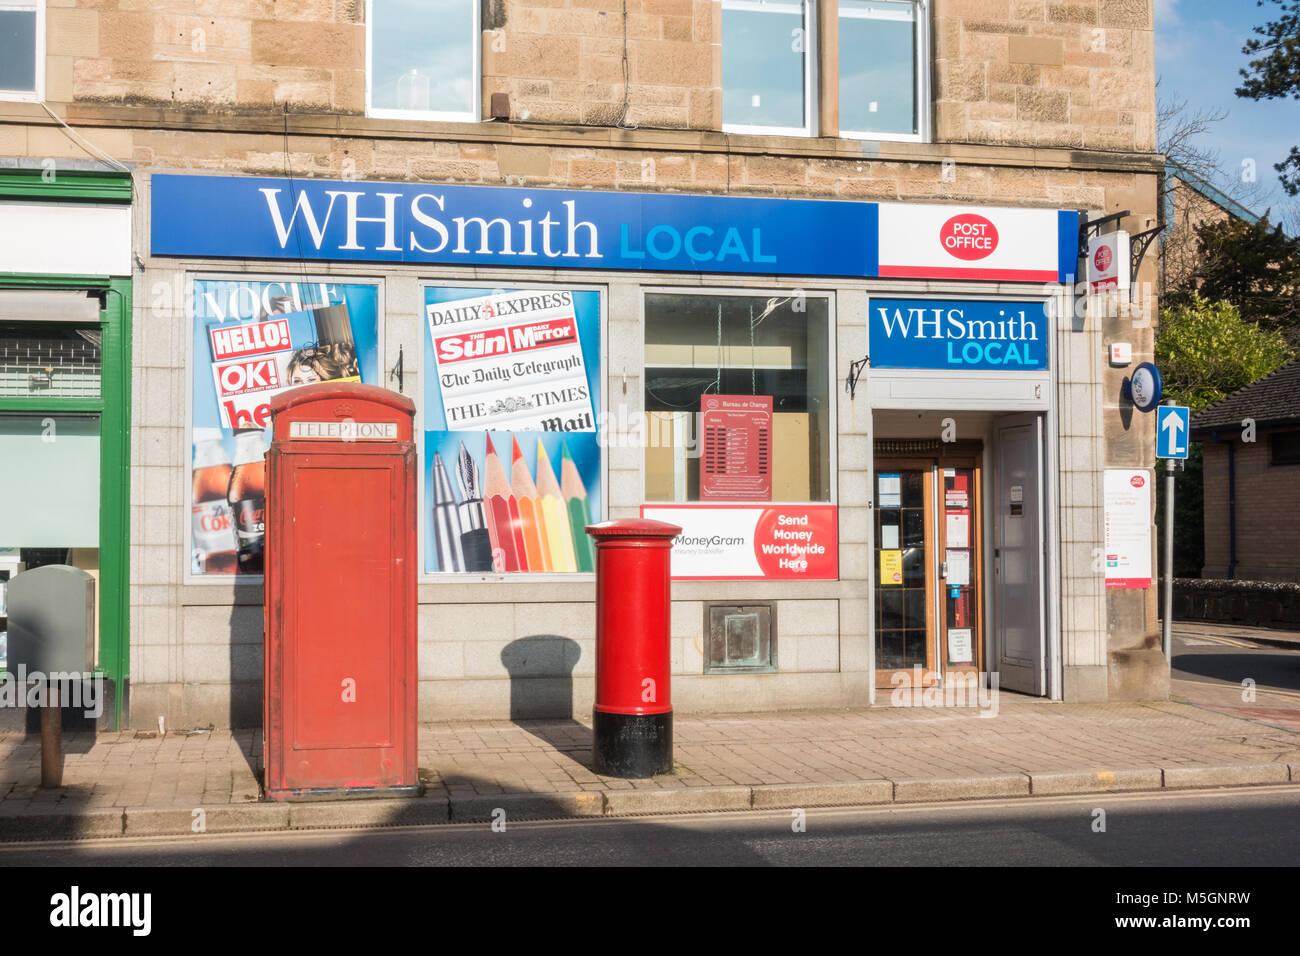 WHSmith Local shop and post office, Bearsden, Glasgow, Scotland, UK - Stock Image